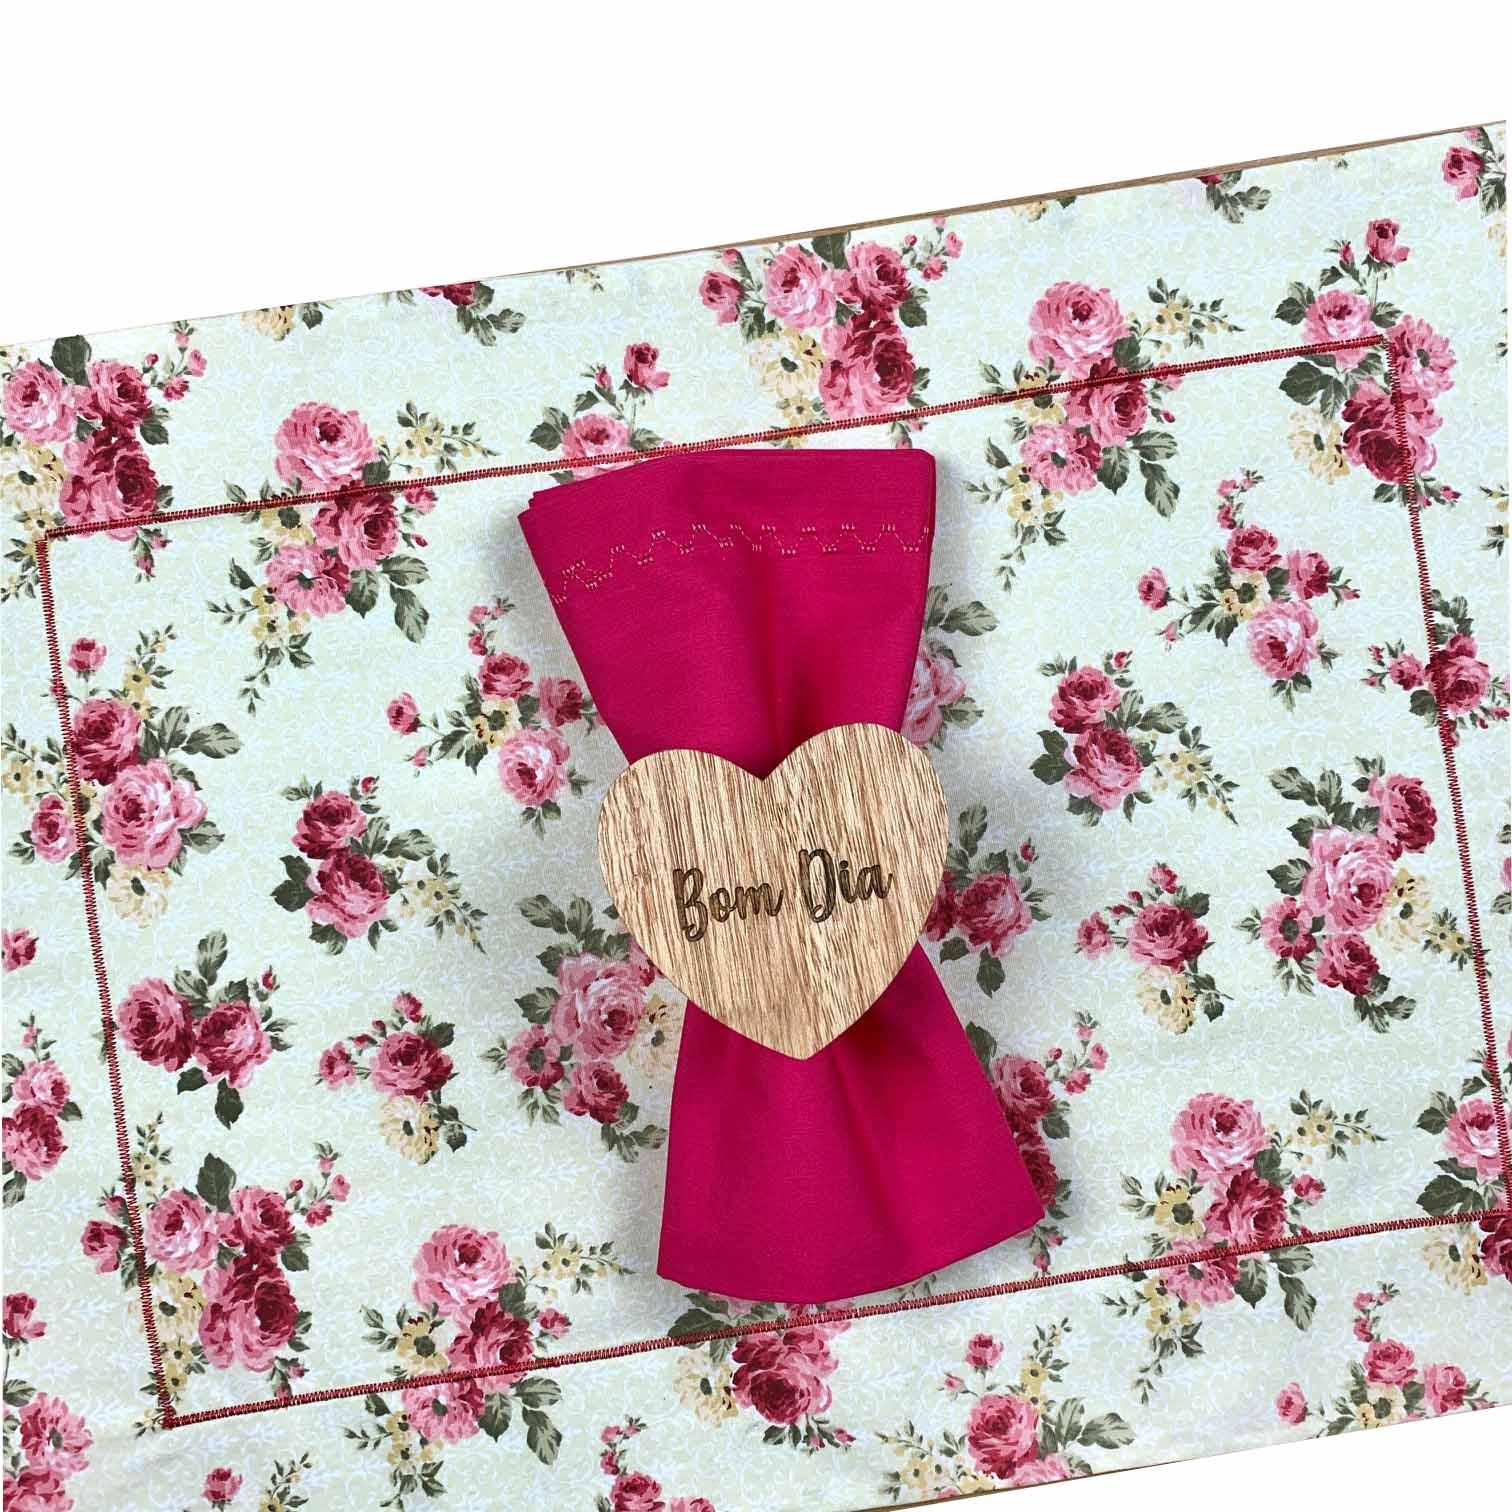 Box Floral Pink Bom dia c/ 6 peças